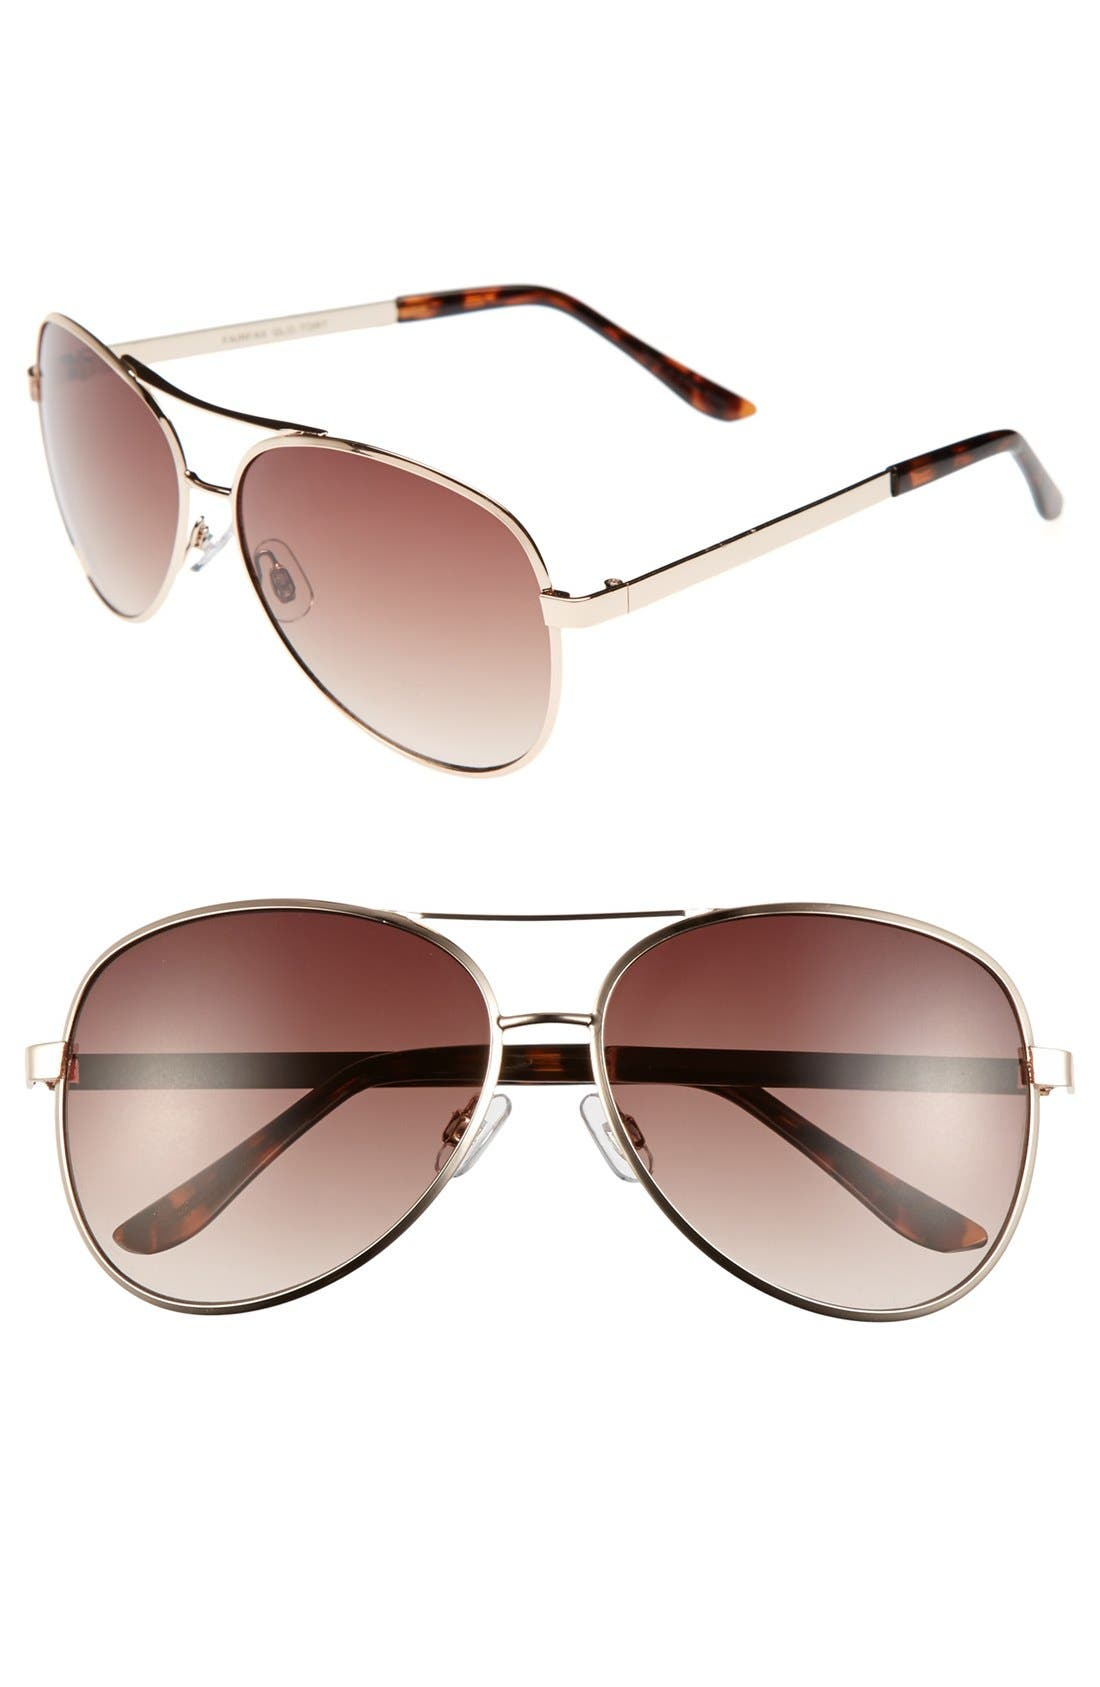 Alternate Image 1 Selected - Outlook Eyewear 'Fairfax' 59mm Aviator Sunglasses